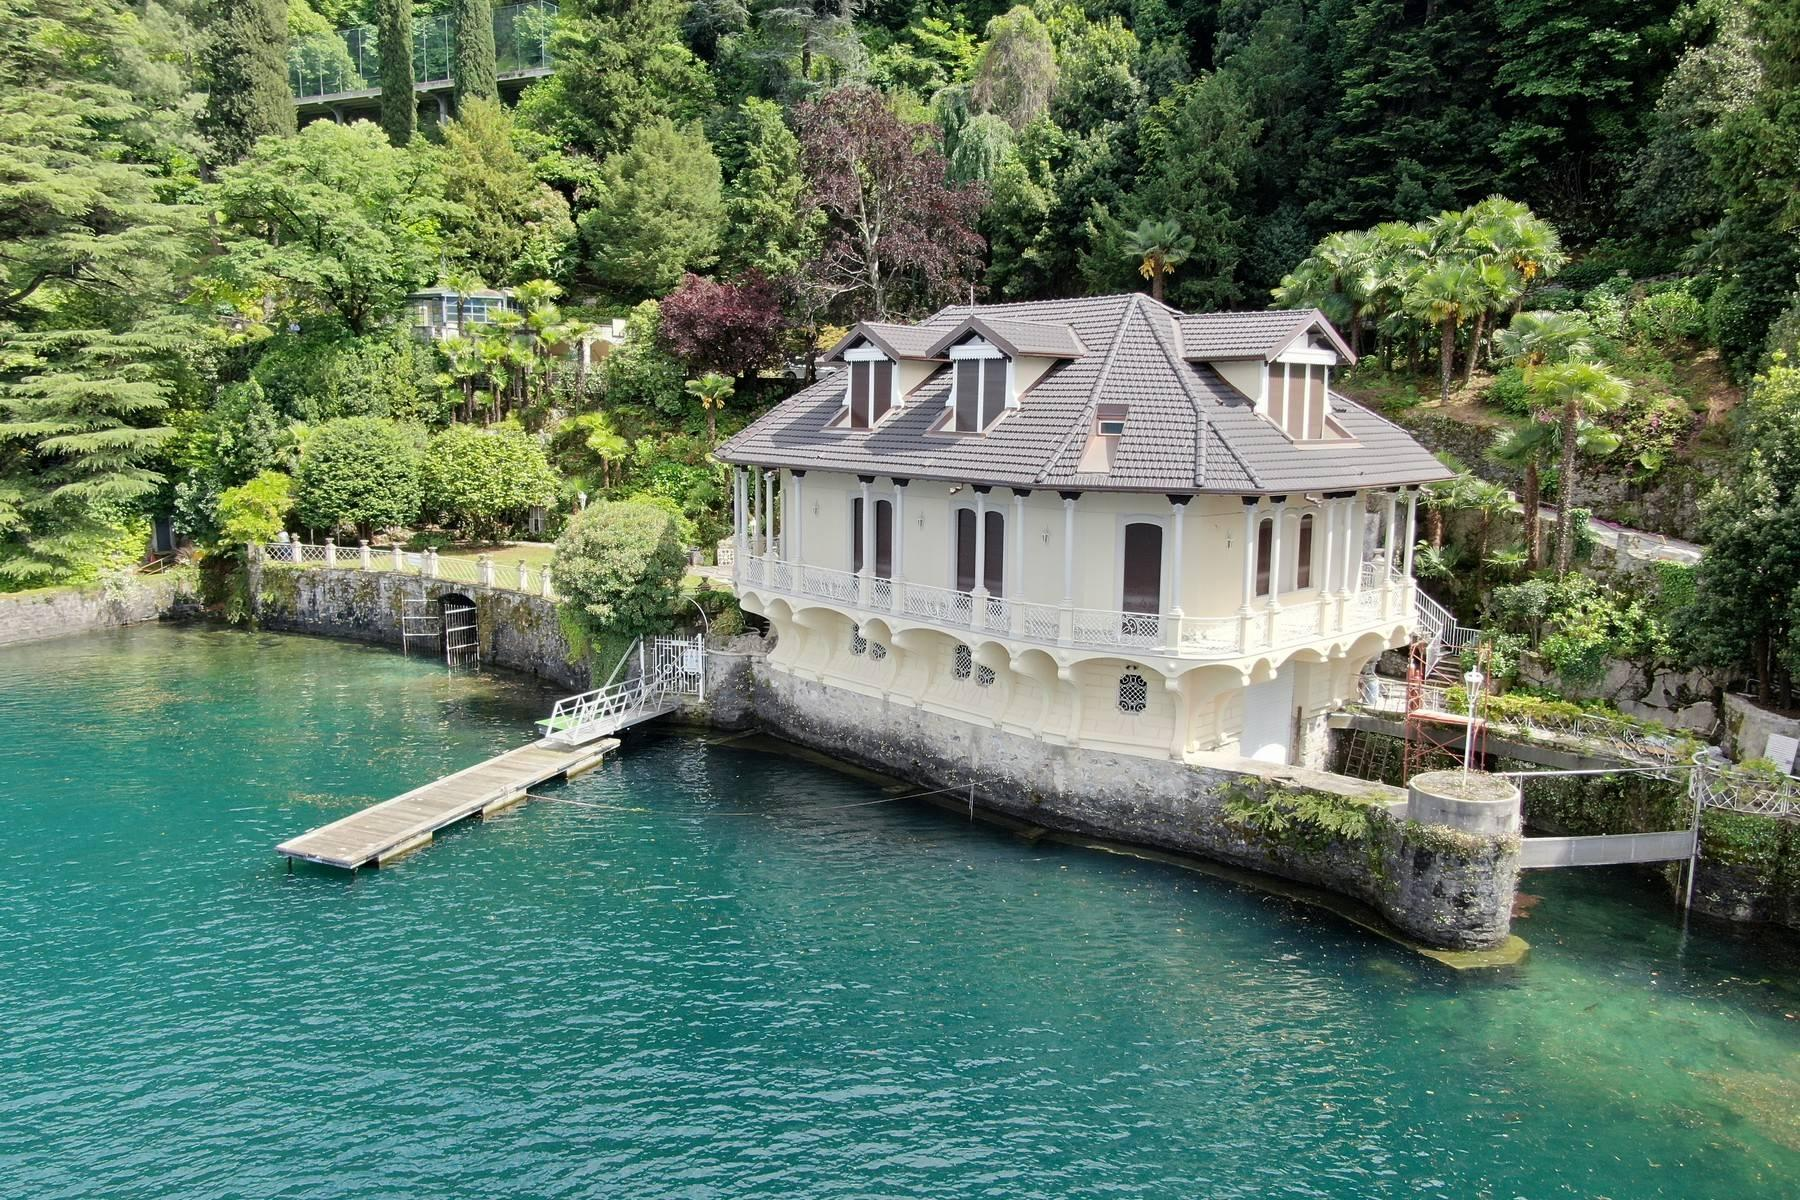 Maestosa Villa in stile Liberty - 3